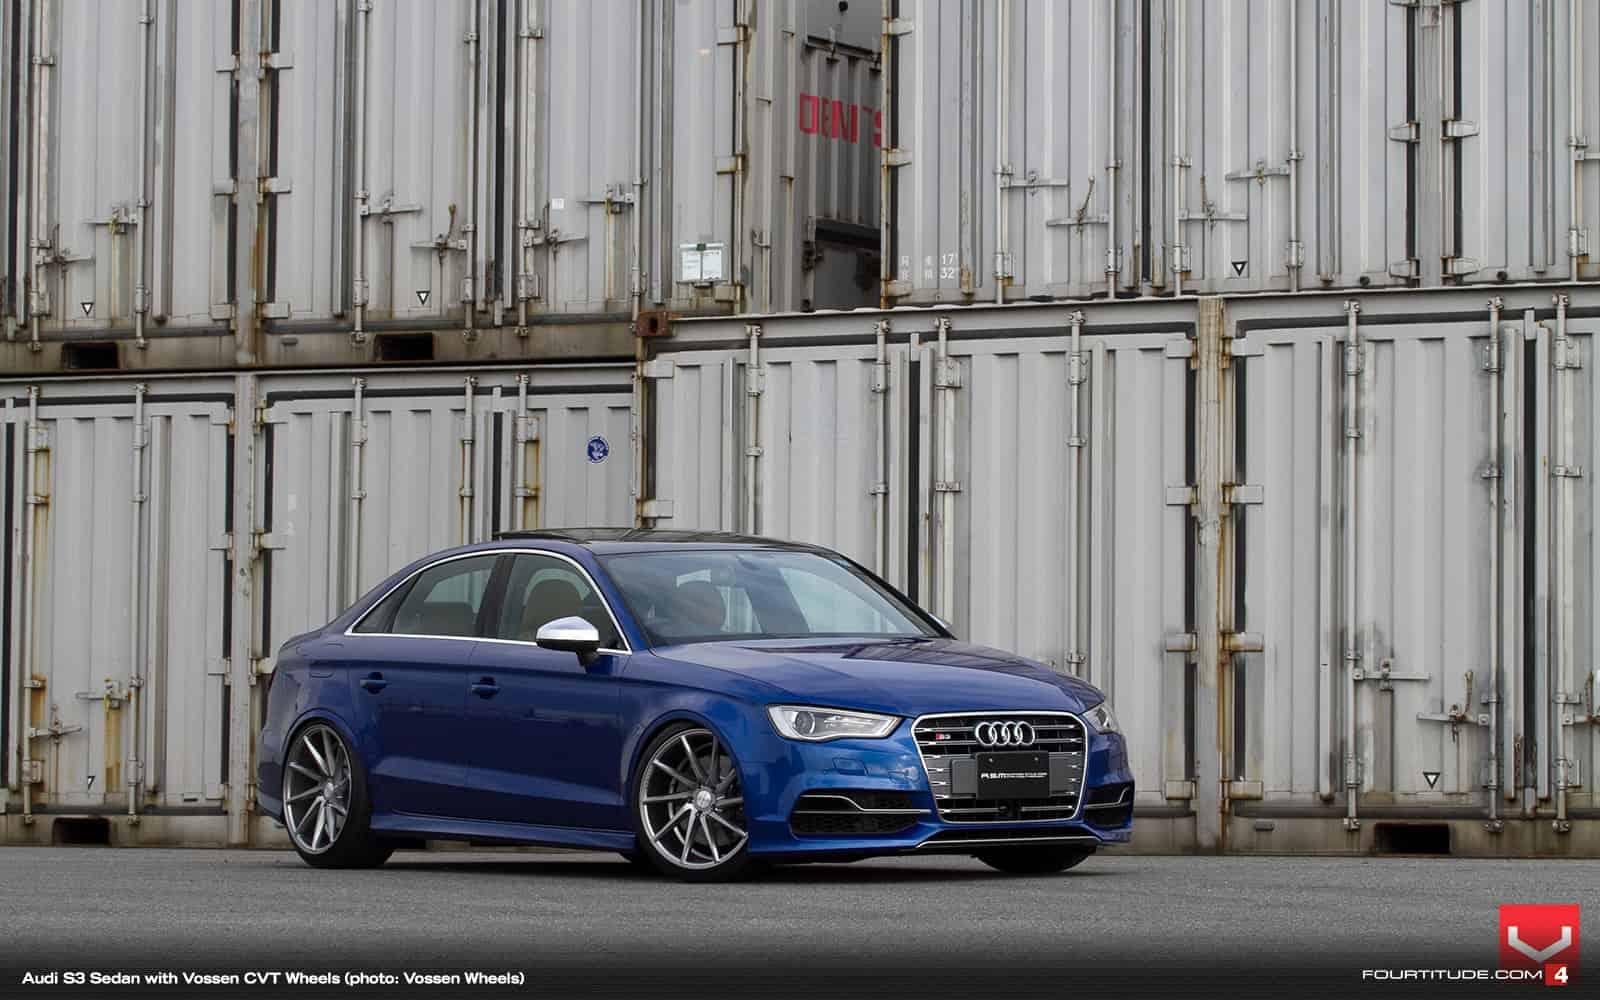 Audi-S3-sedan-Vossen-CVT-Naples-Speed-344